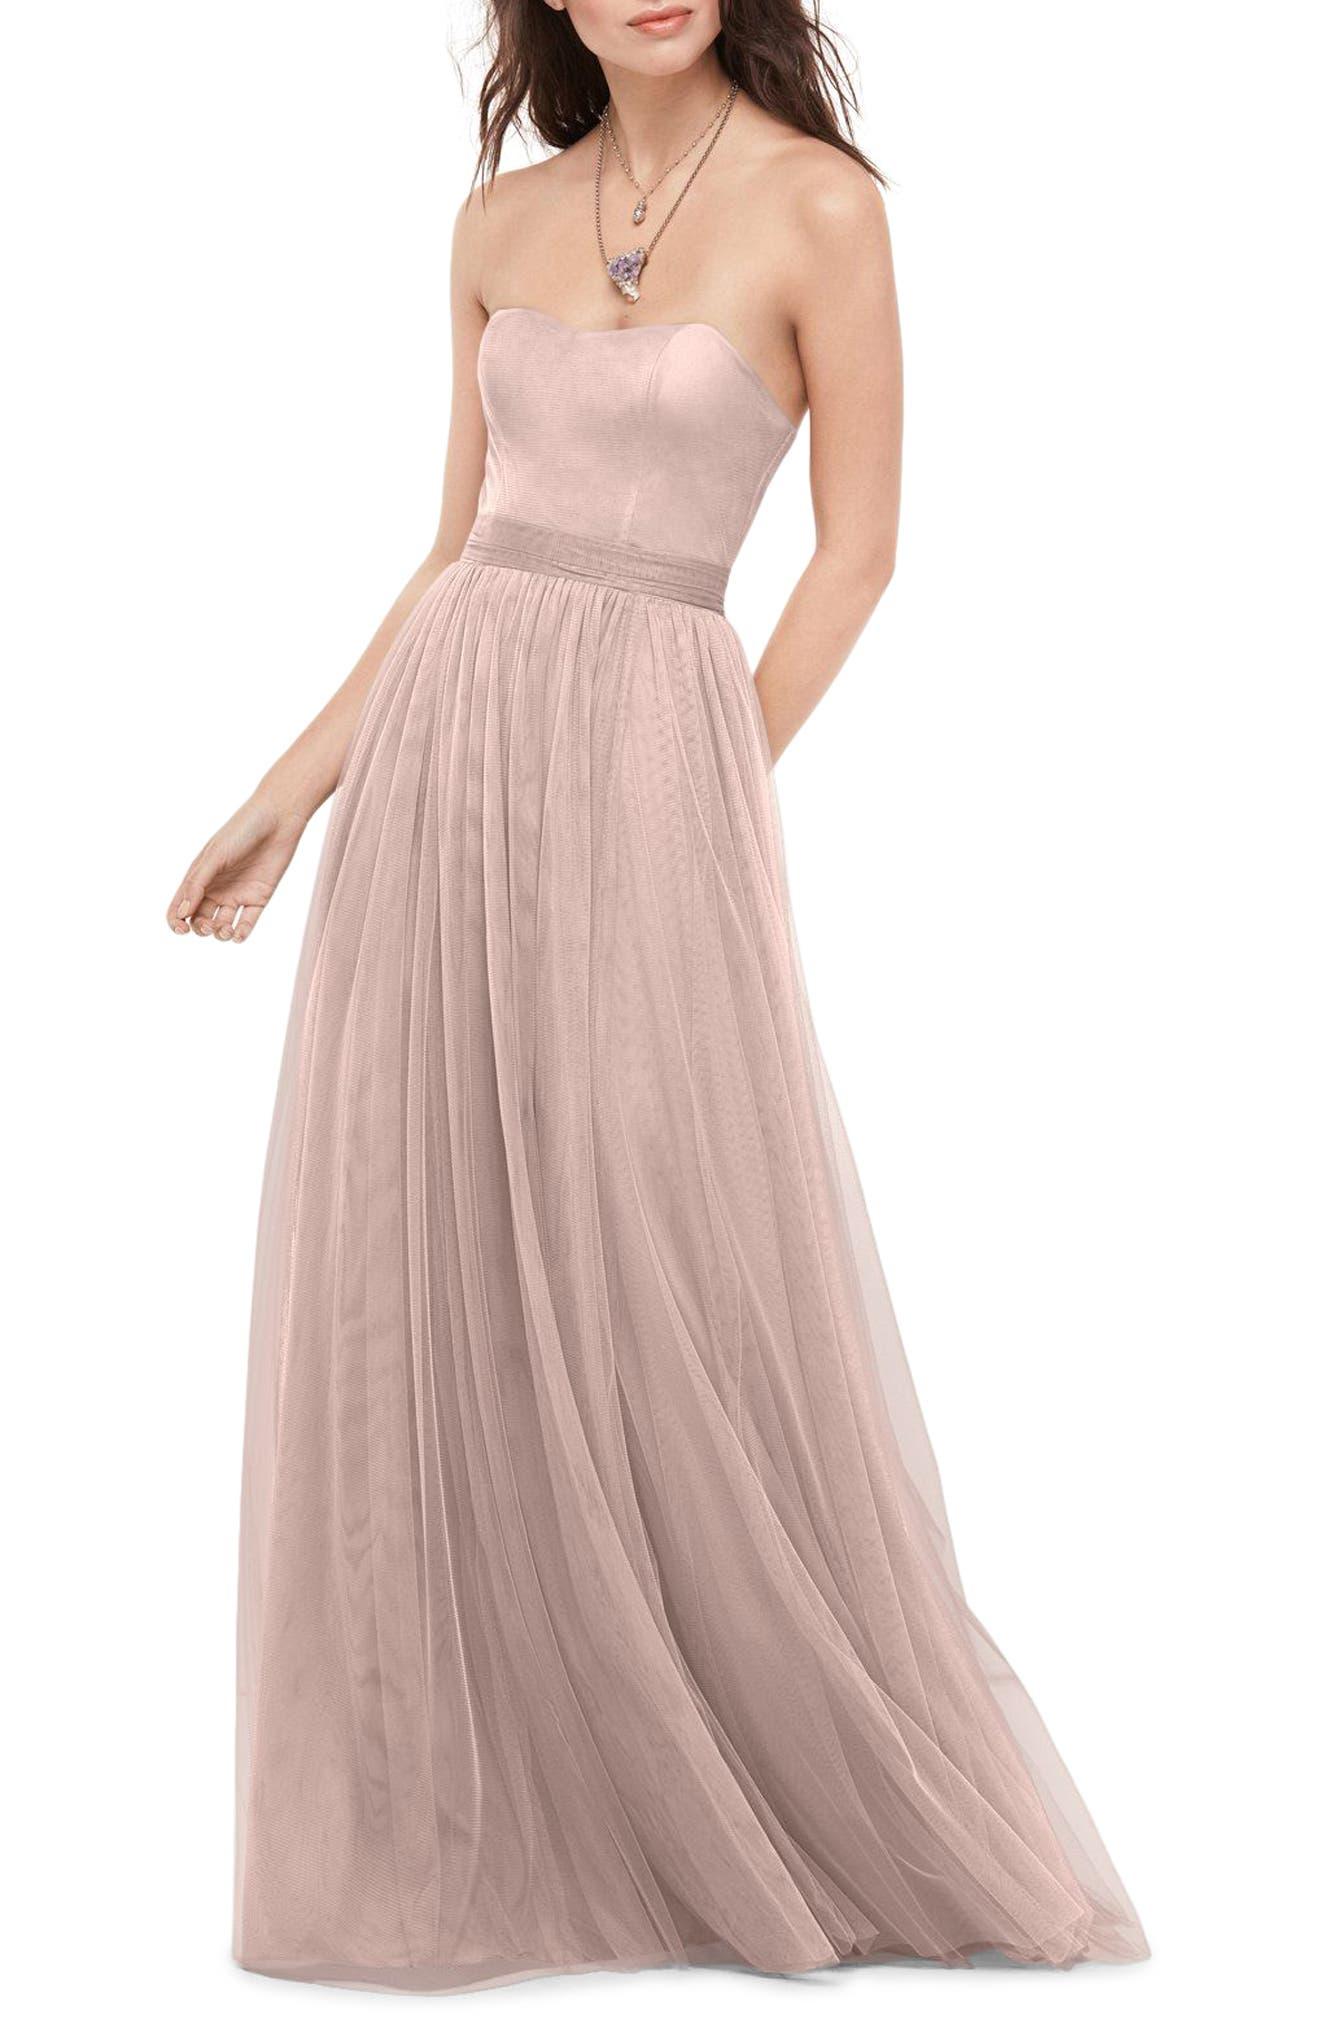 WTOO Bobbinet Strapless Gown